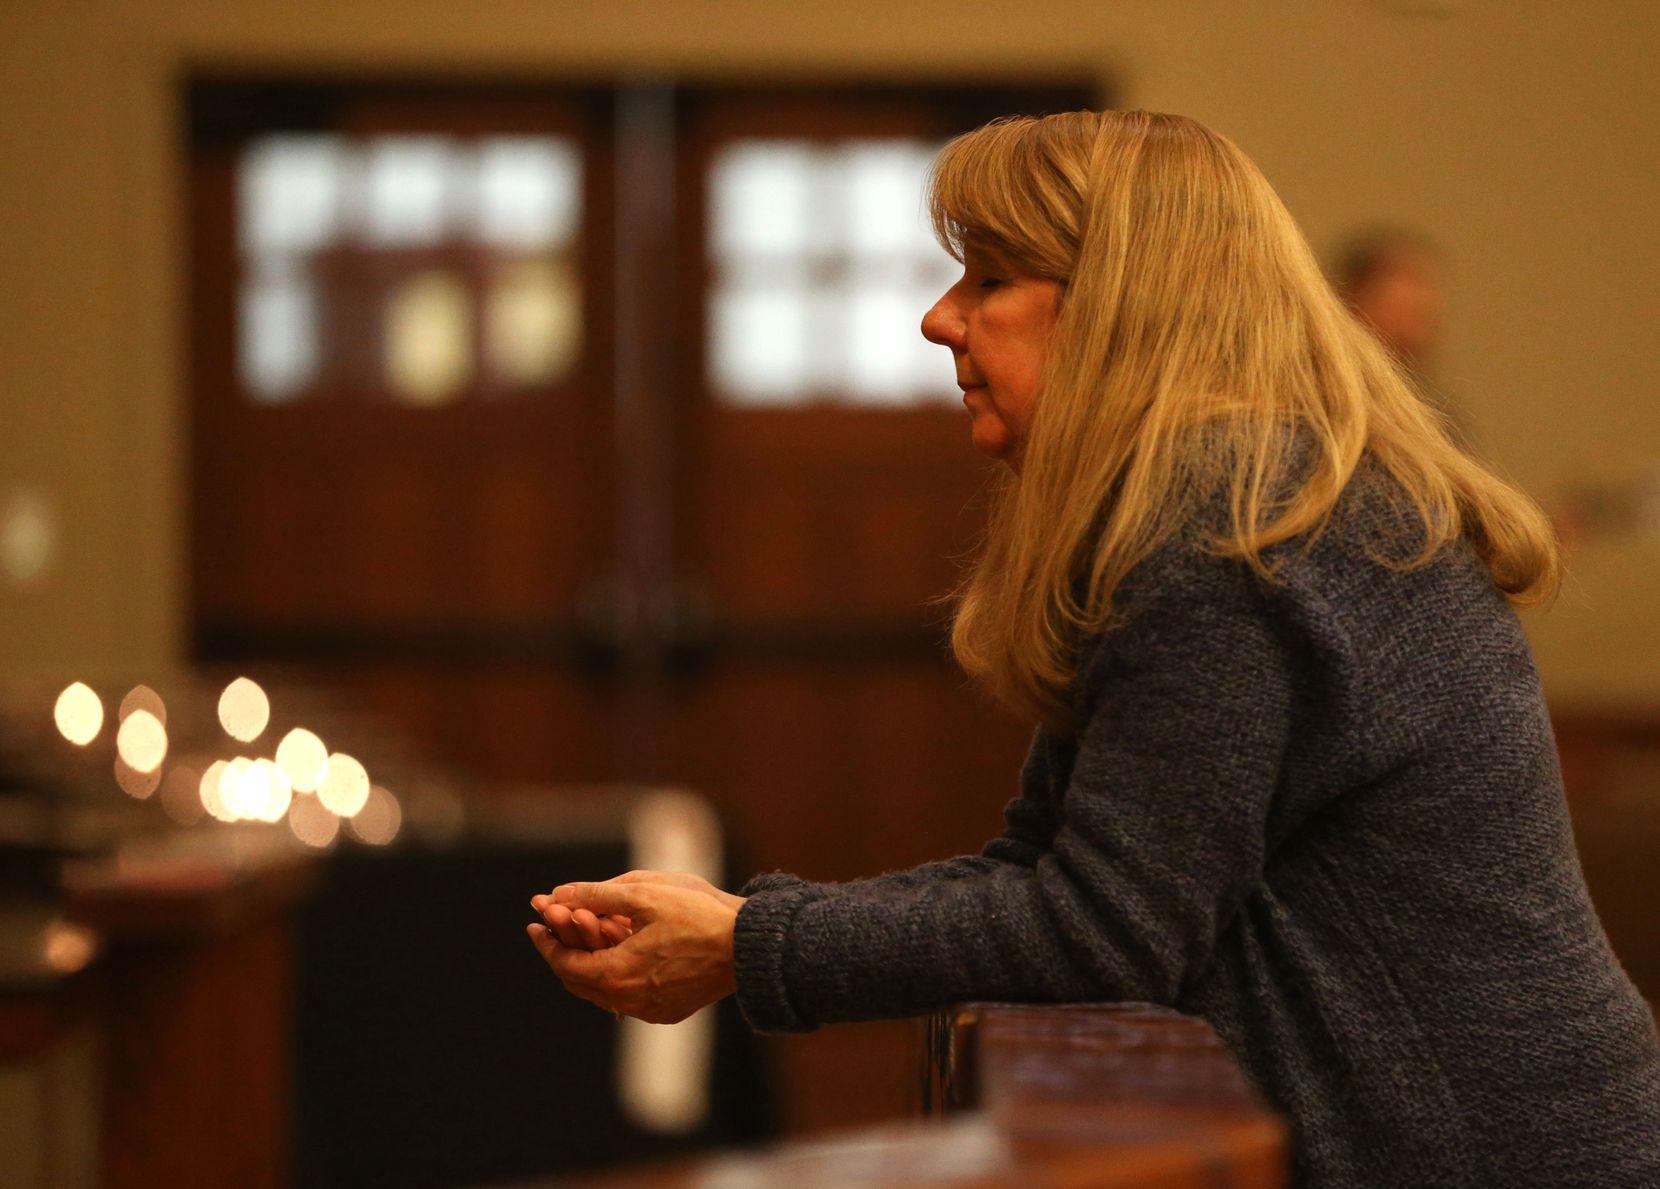 The Rev. Laura Echols-Richter prays in the sanctuary at Grace Avenue United Methodist Church in Frisco.